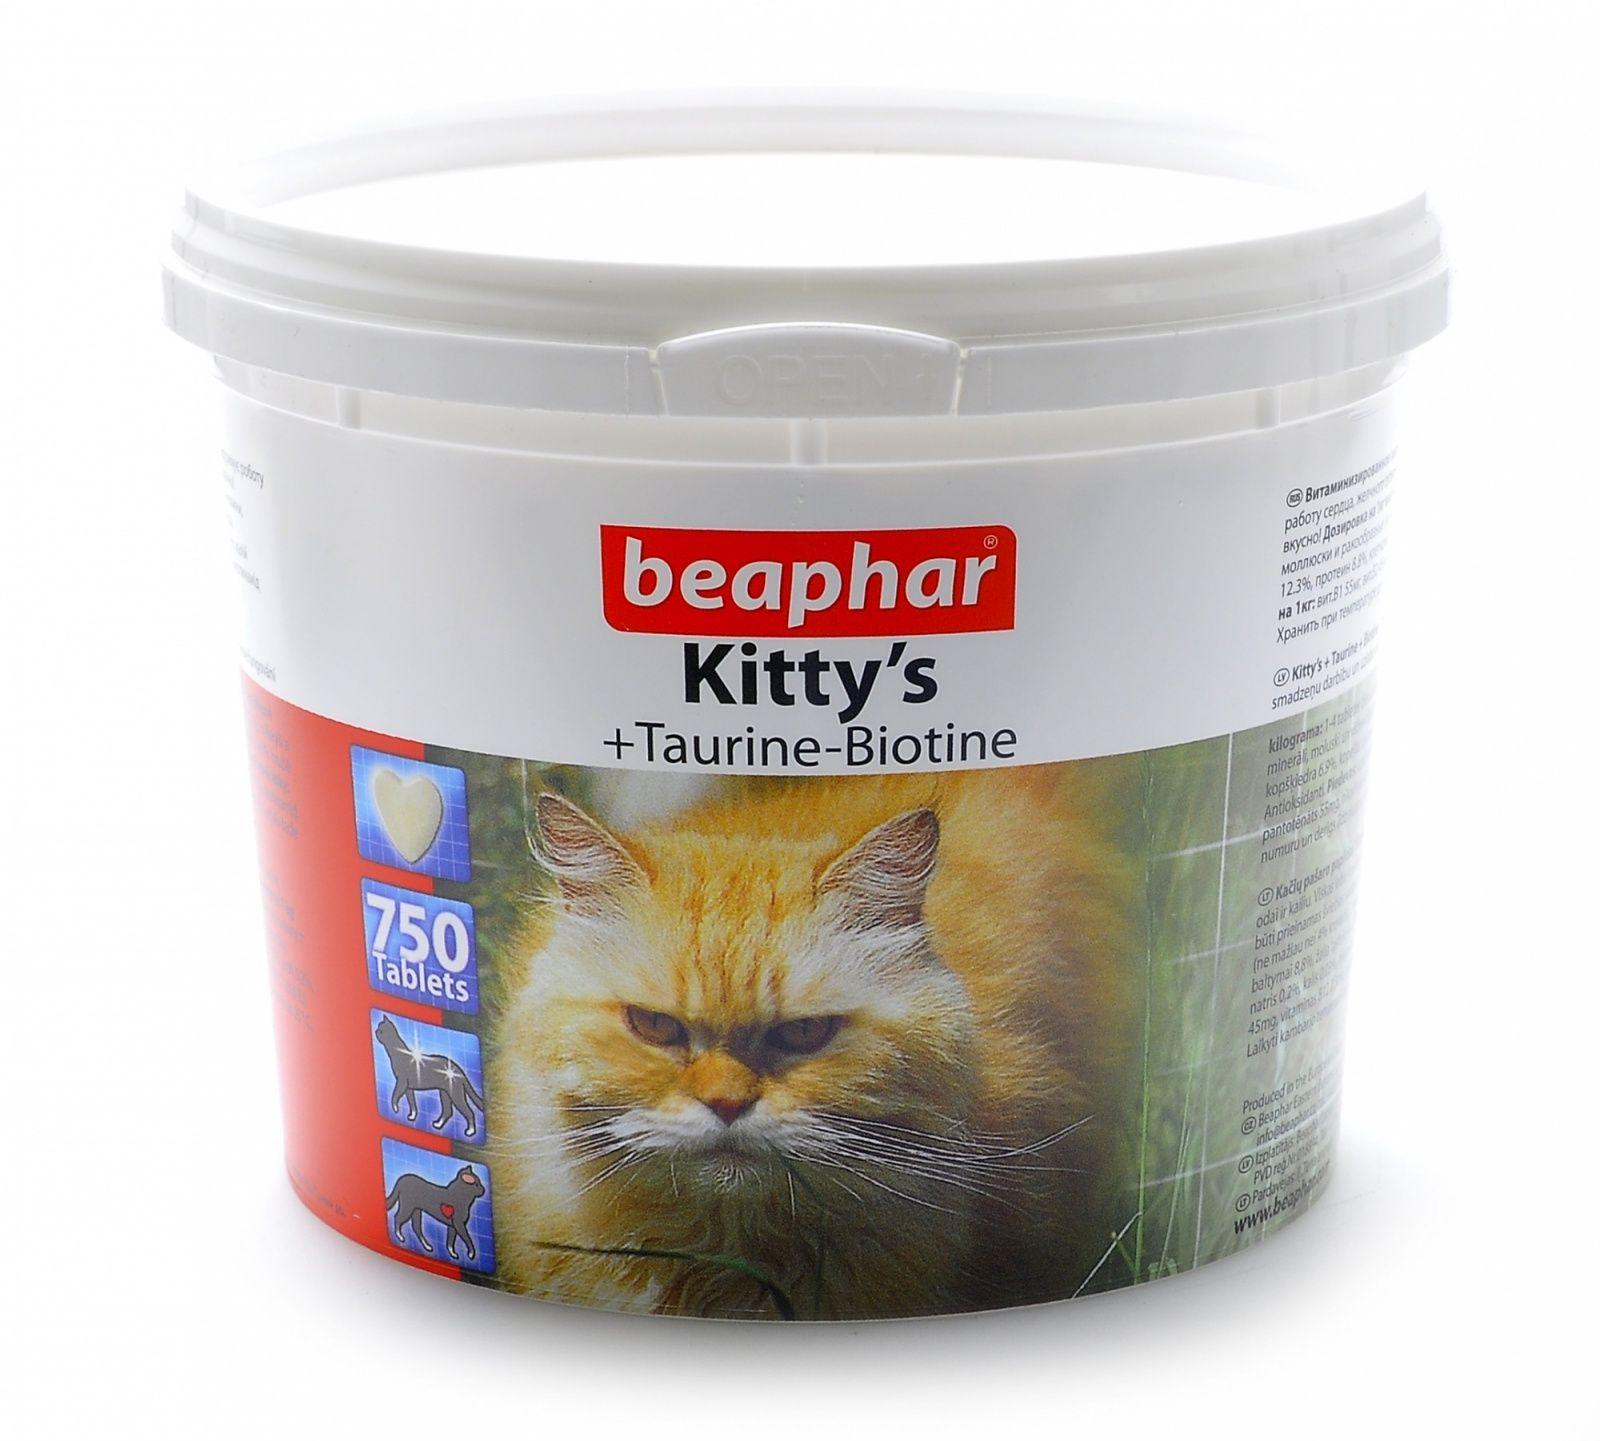 Beaphar Витамины д/кошек с таурином и биотином, сердечки Kitty's Taurine + Biotin, 750шт. от Ravta